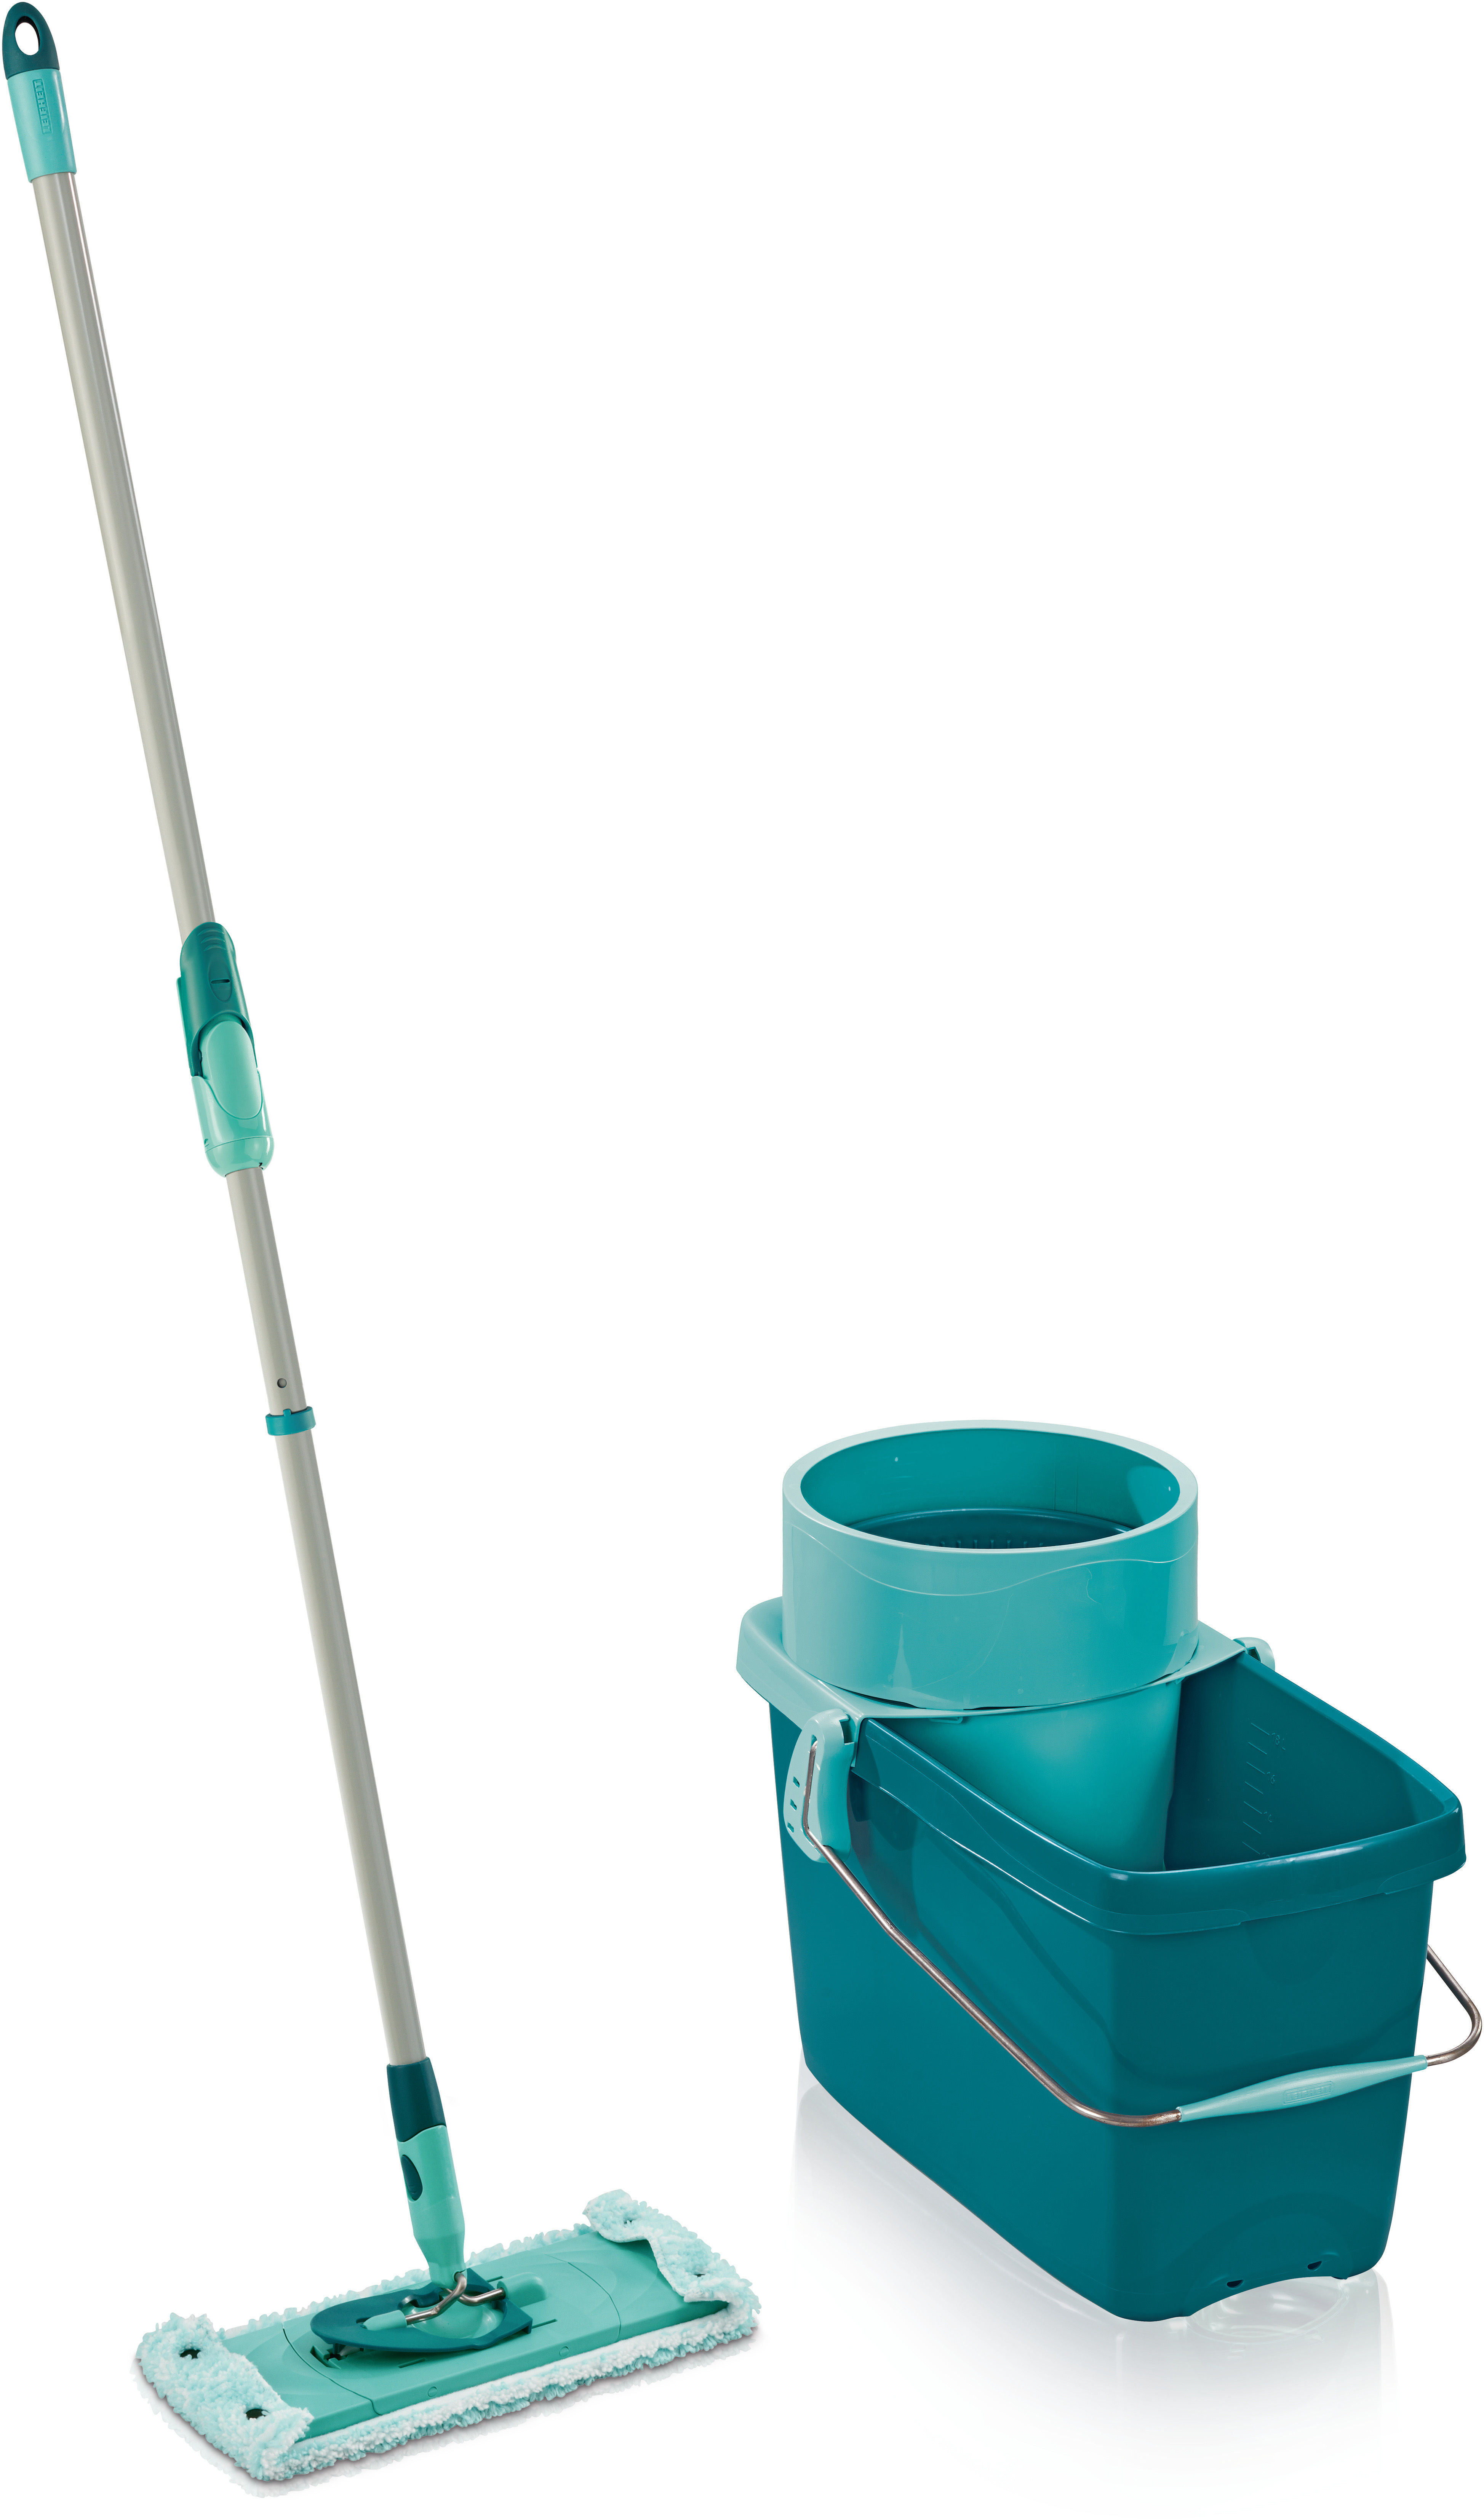 KIT DE NETTOYAGE CLEAN TWIST SYSTEM seau + balai